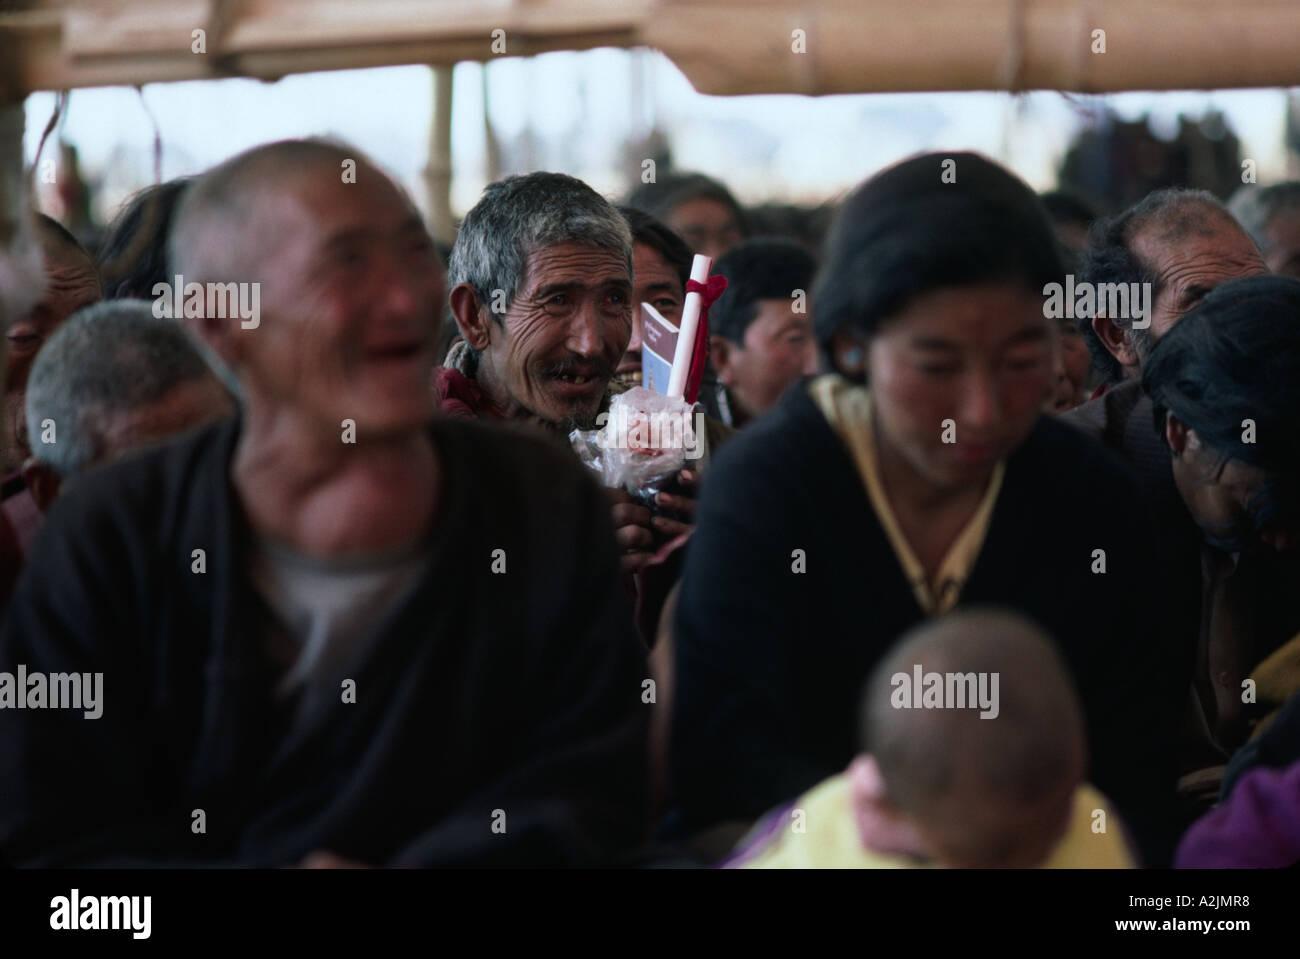 Pilgrims listening with awe to the teachings of the Dalai Lama. India - Stock Image